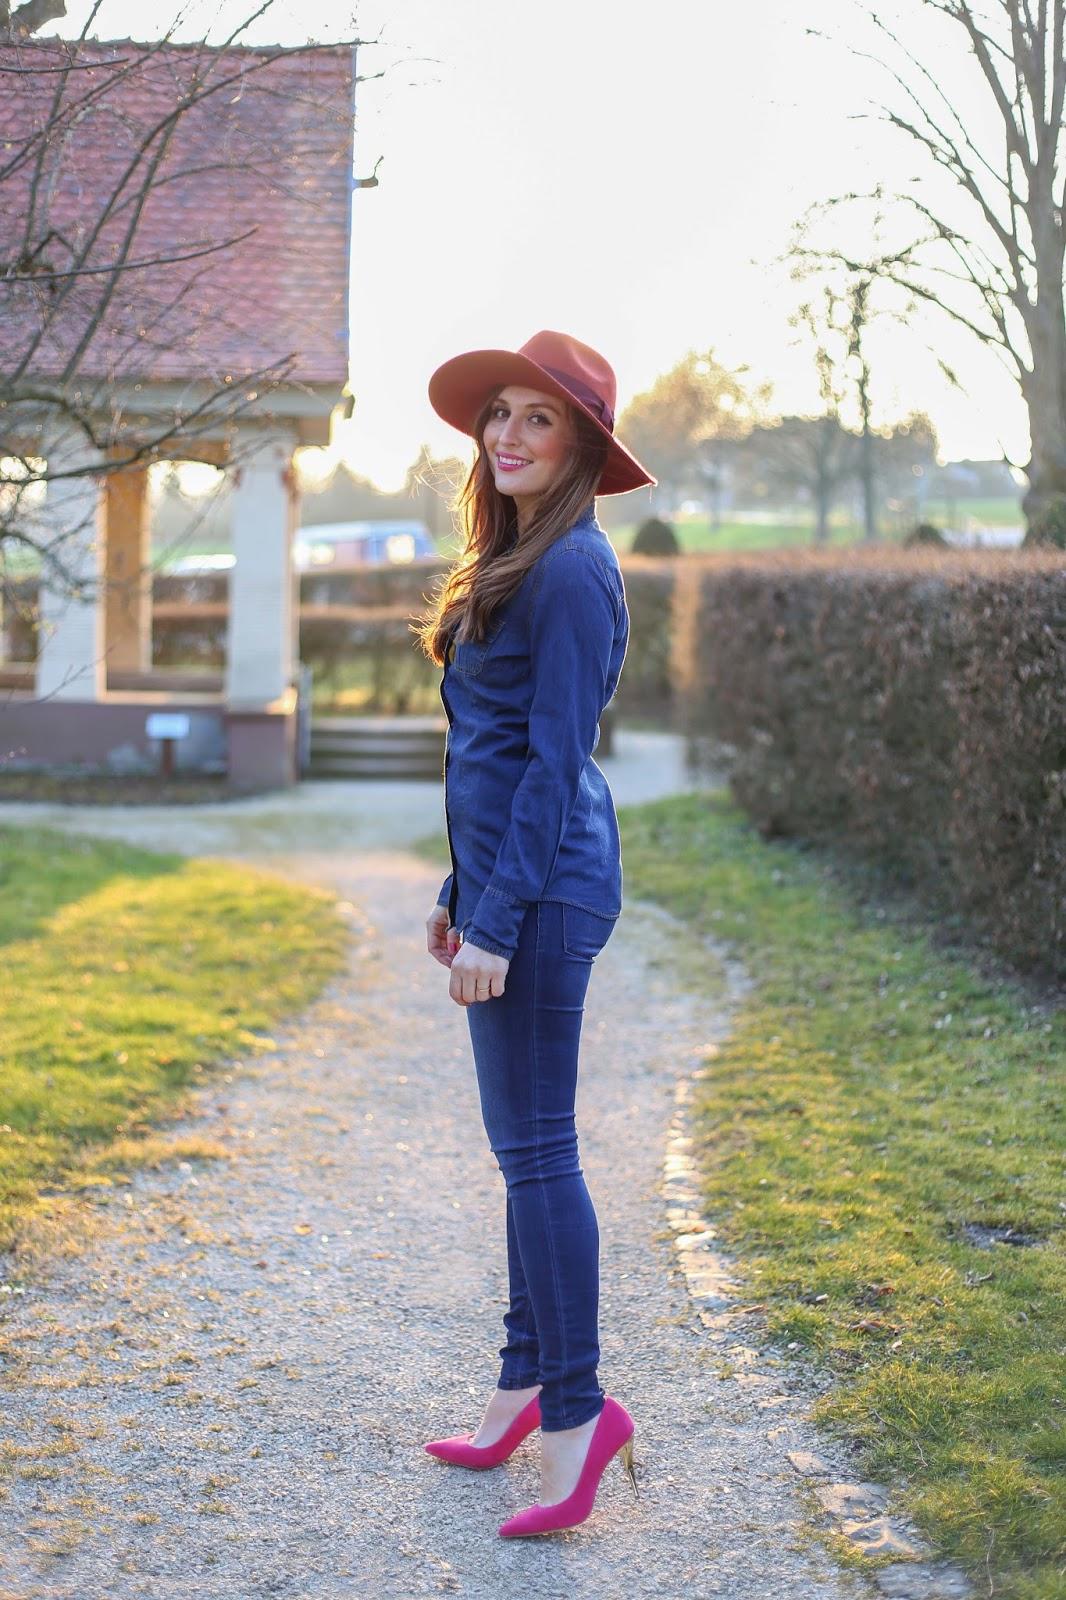 Frankfurter Fashionblogger - Fashionstylebyjohanna